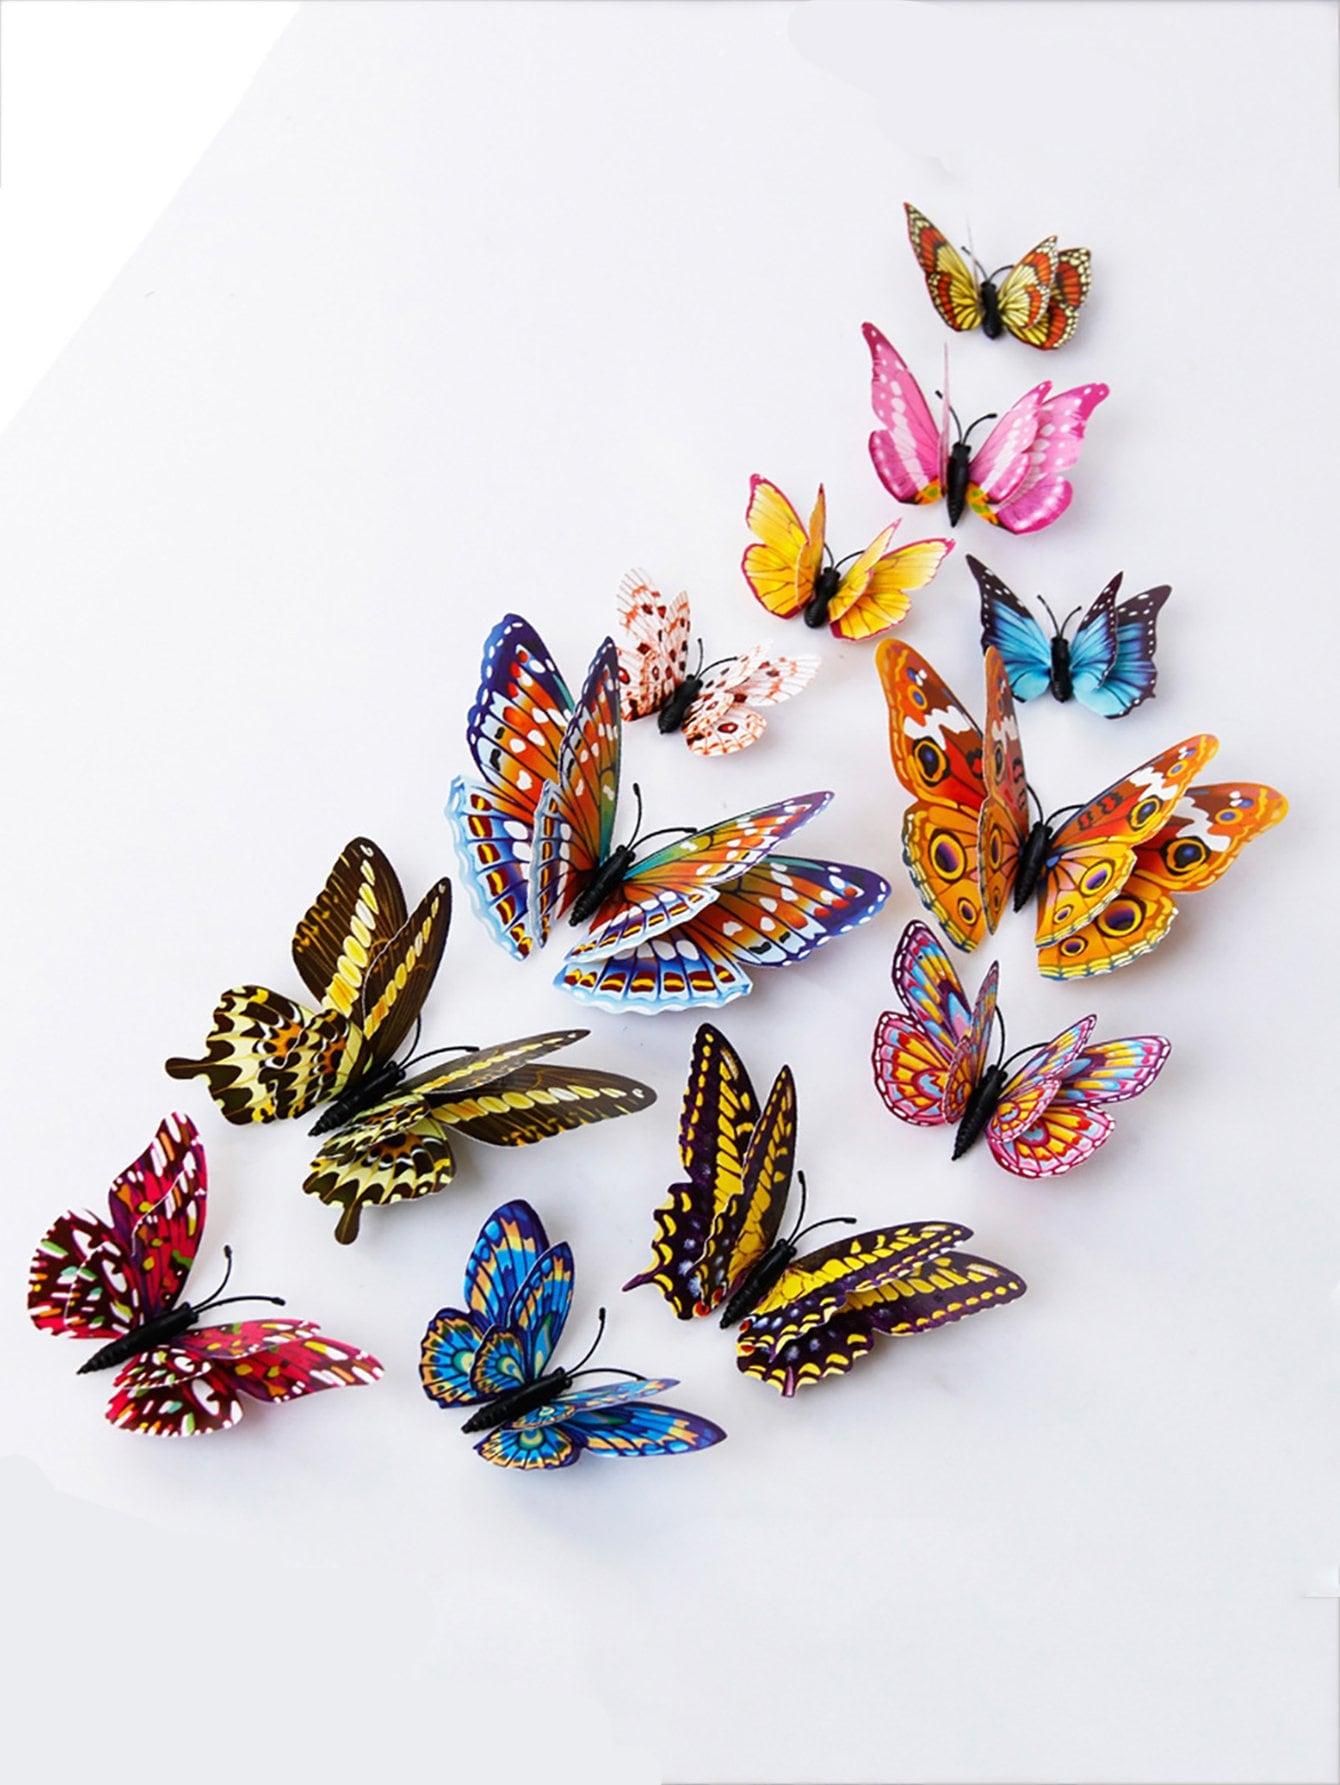 Leuchtender 3D Schmetterlings-Wandaufkleber 12pcs